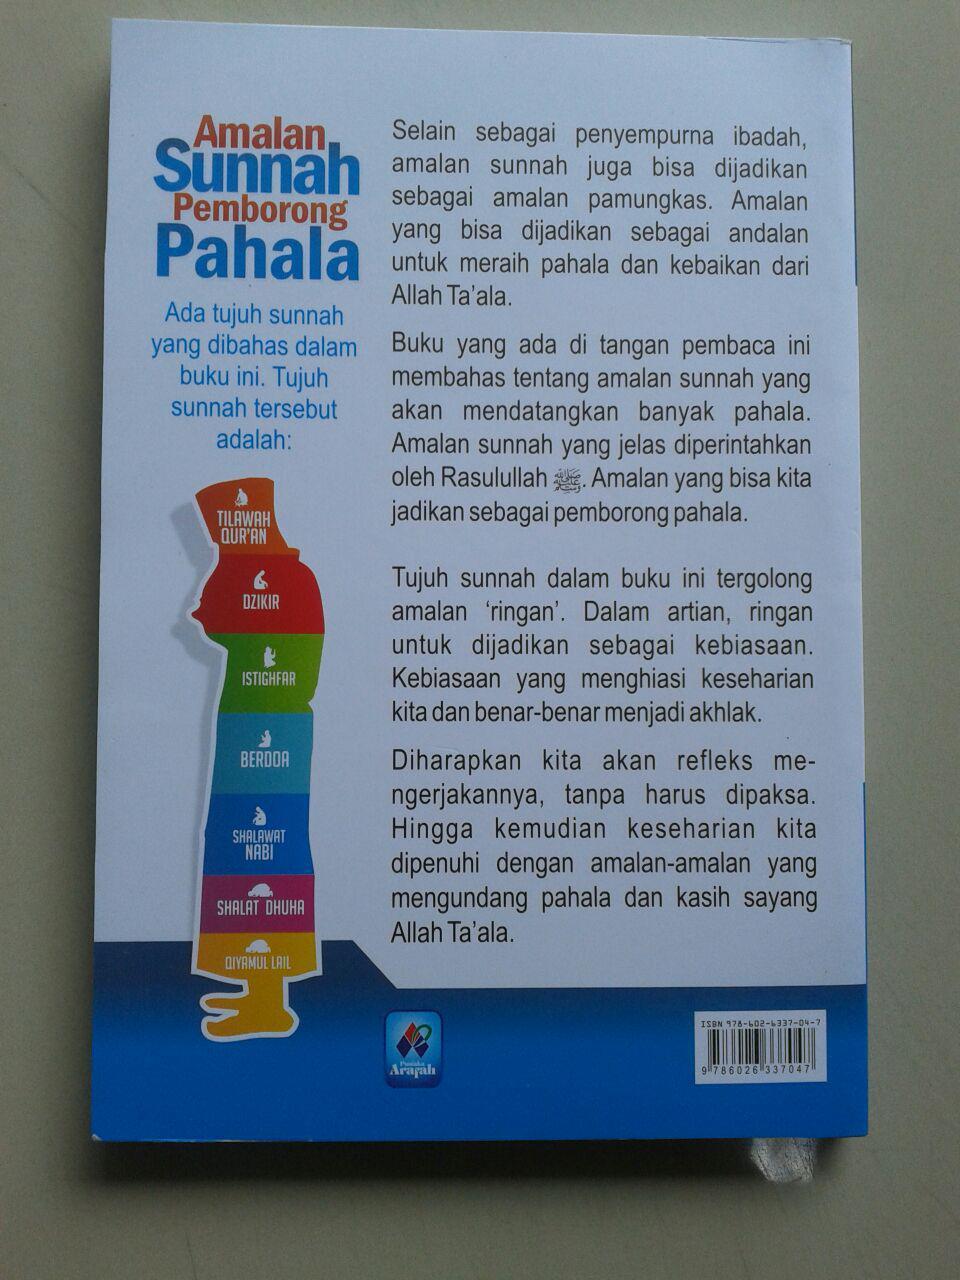 Buku Amalan Sunnah Pemborong Pahala cover